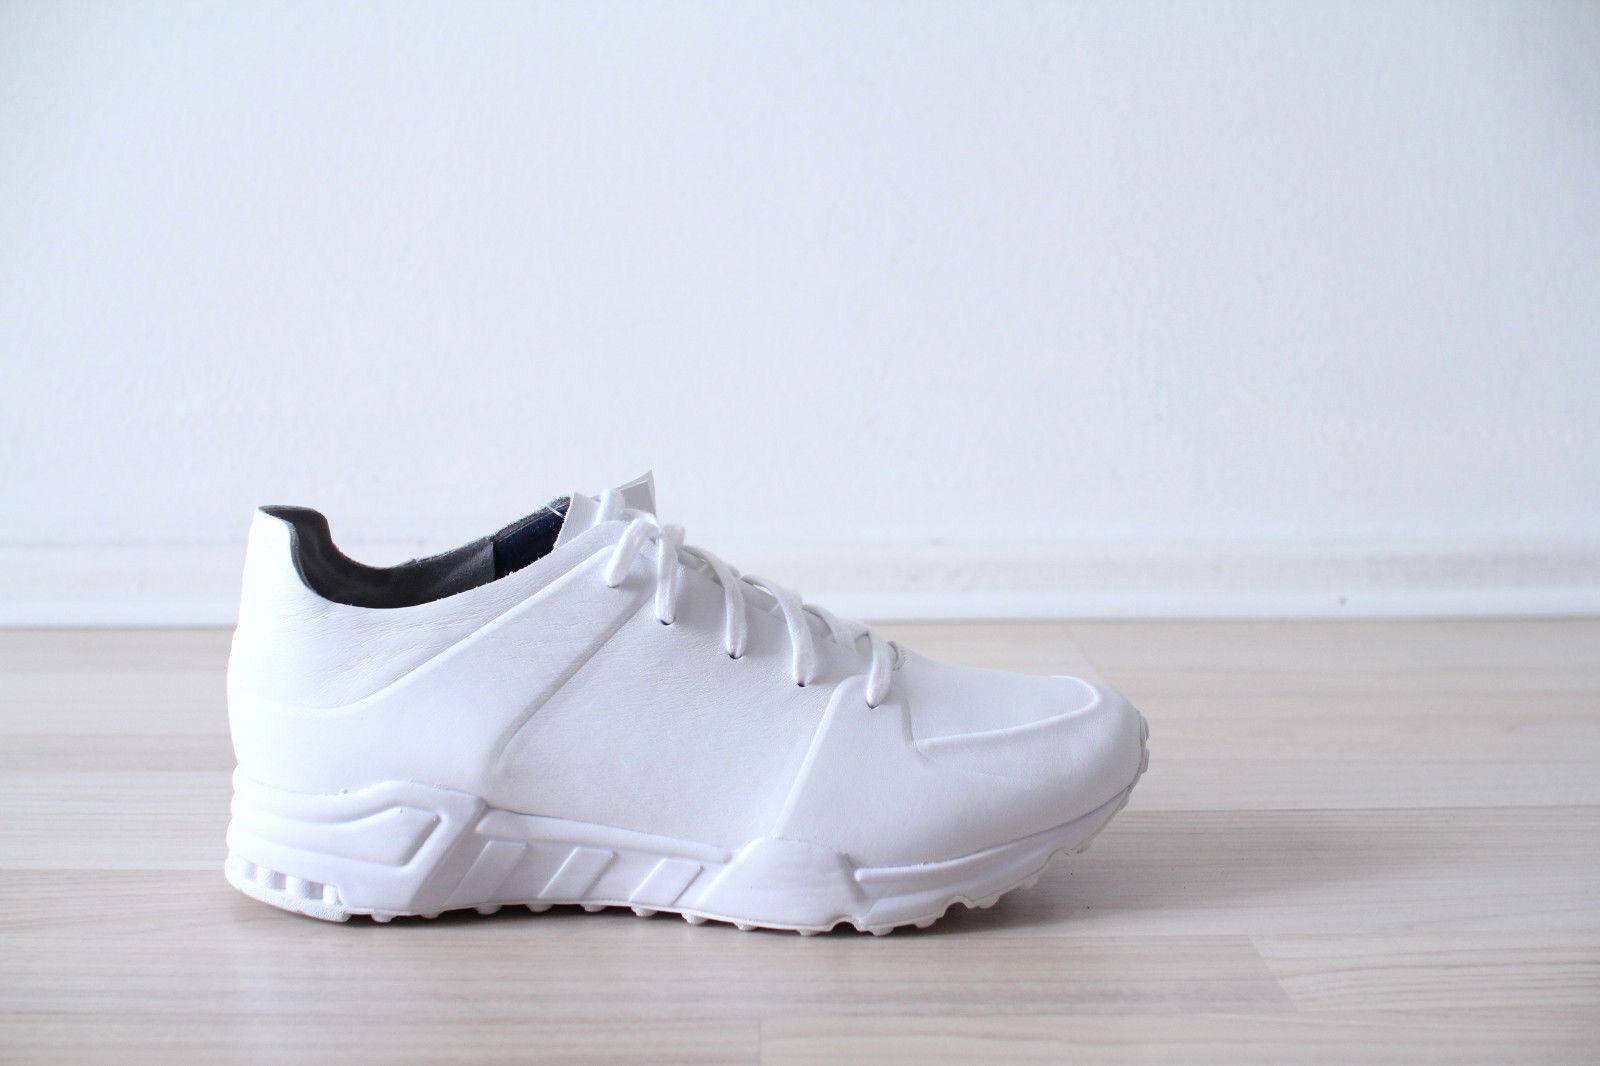 Adidas Equipment Support 93 Nuude Weiß Gr. 40,42 NEU & OVP S76702